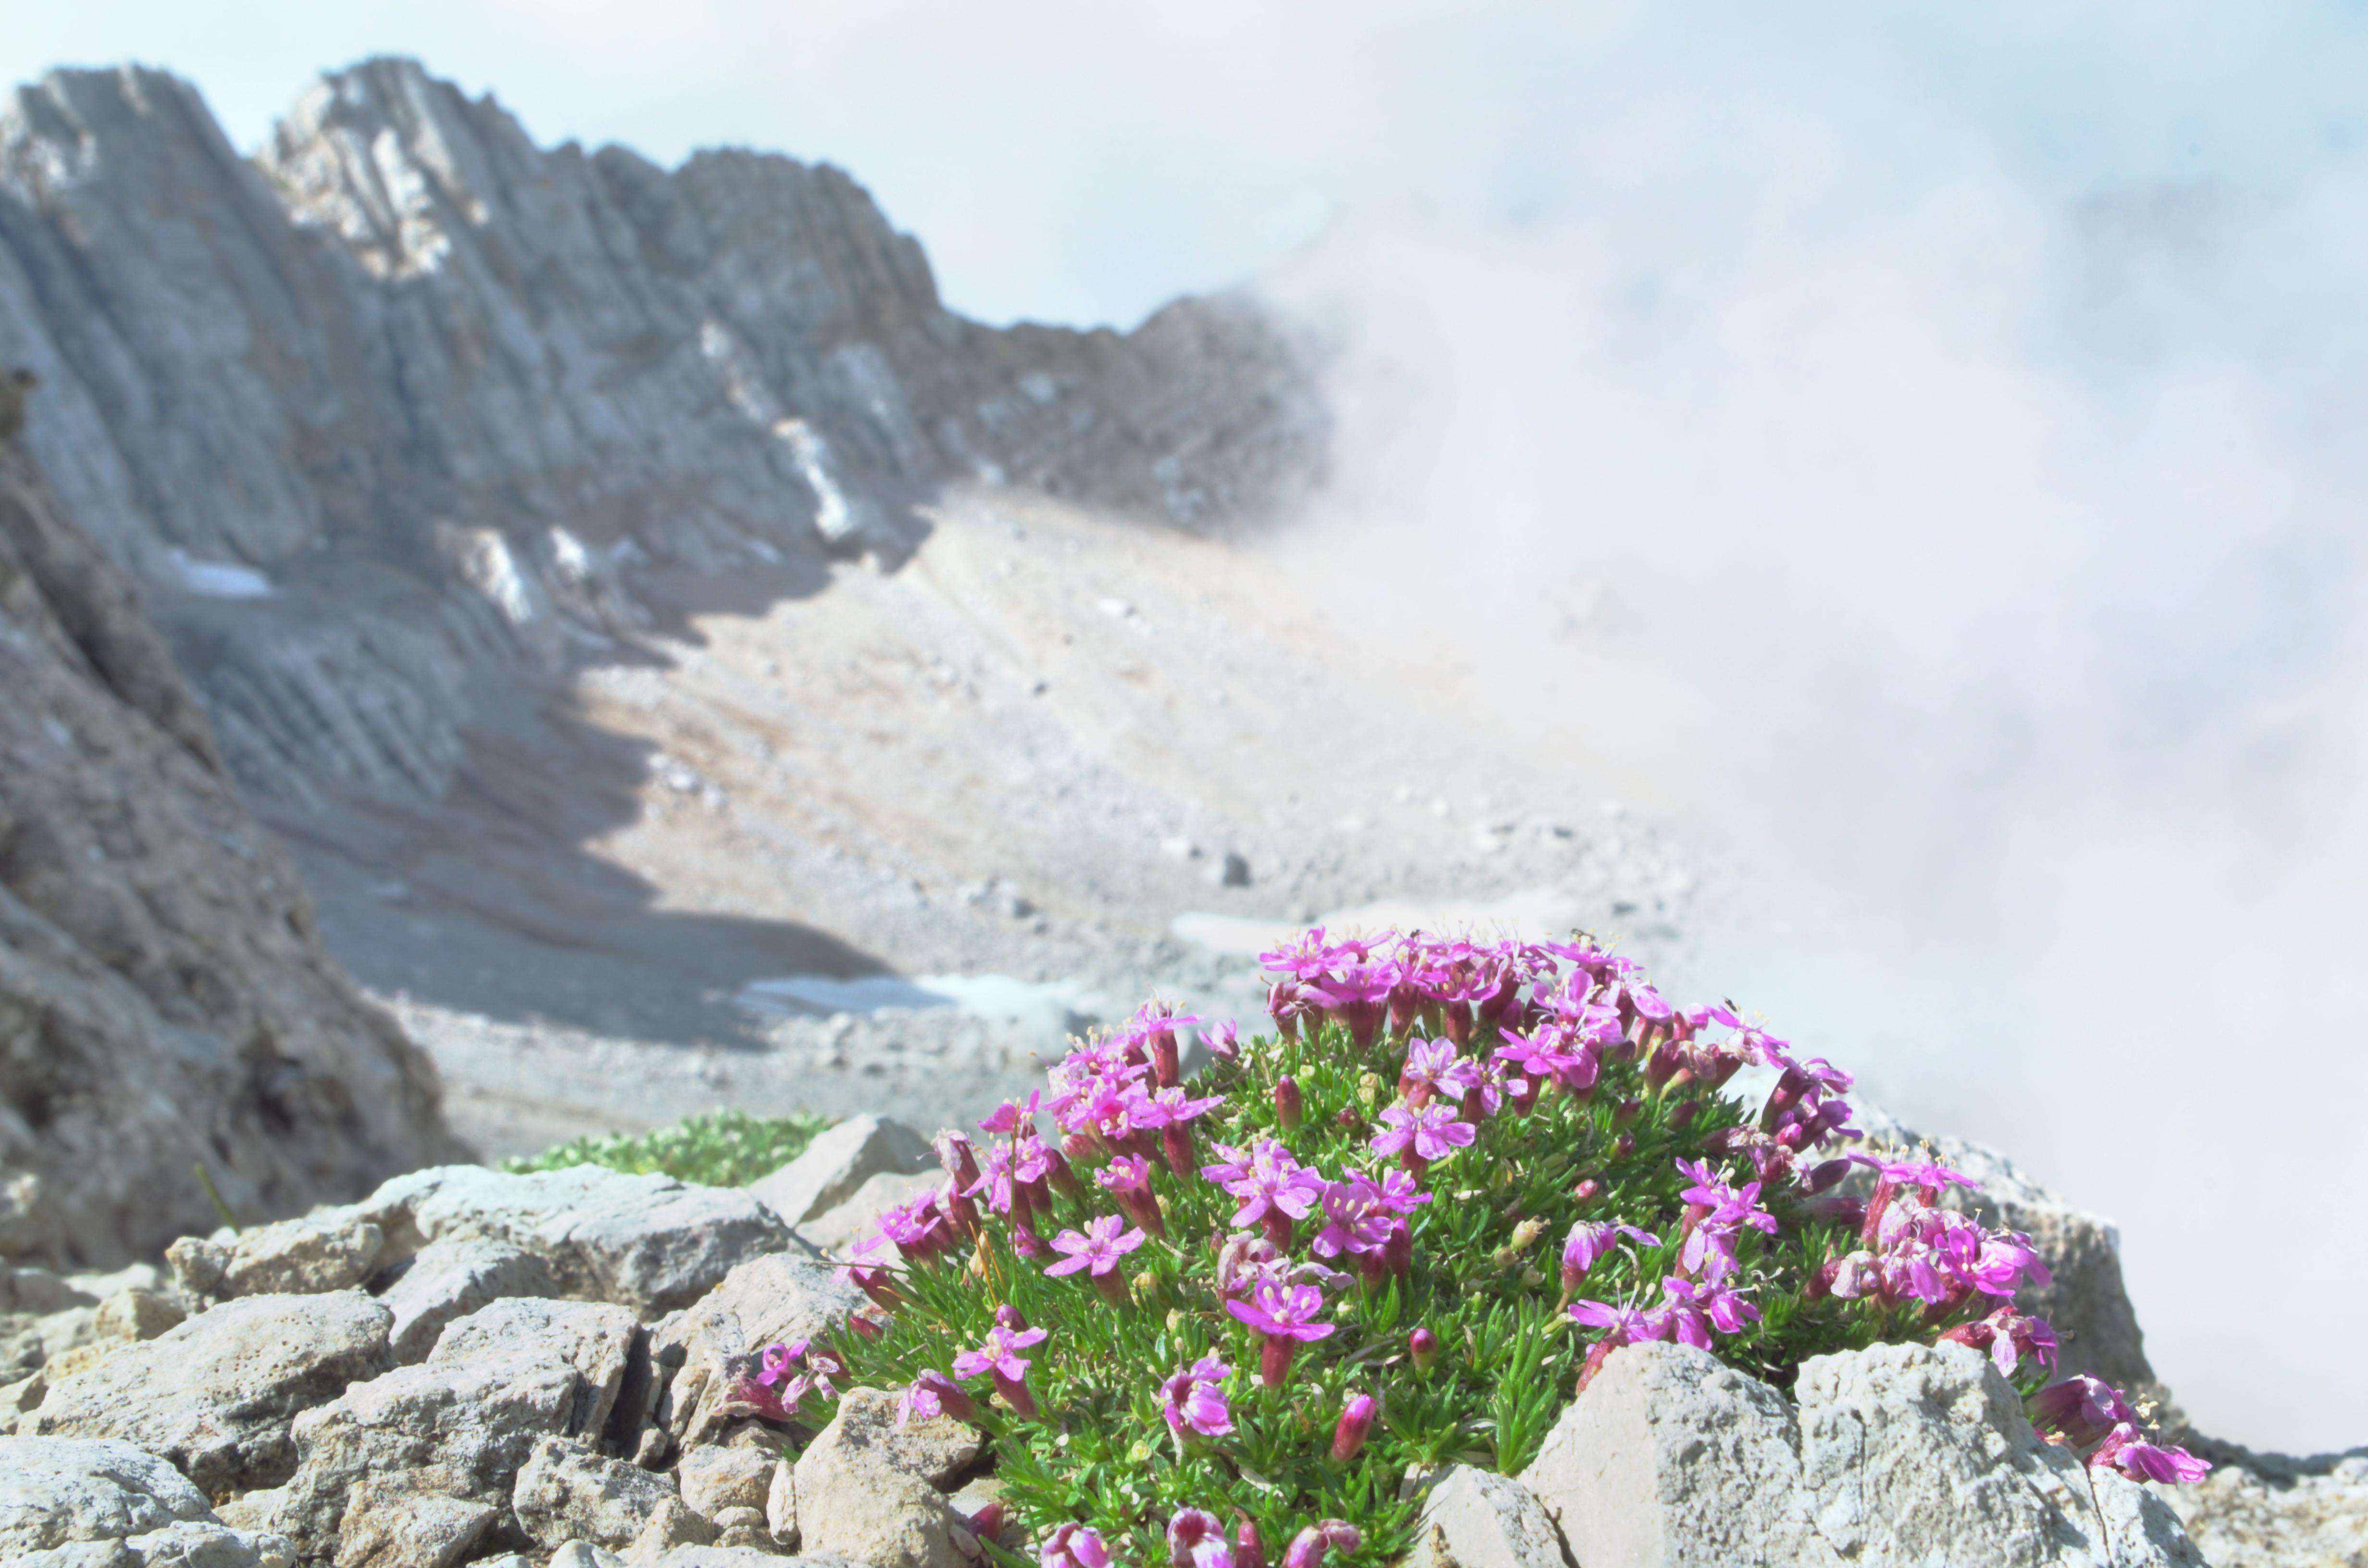 The Arctic Alpine Botanic Garden